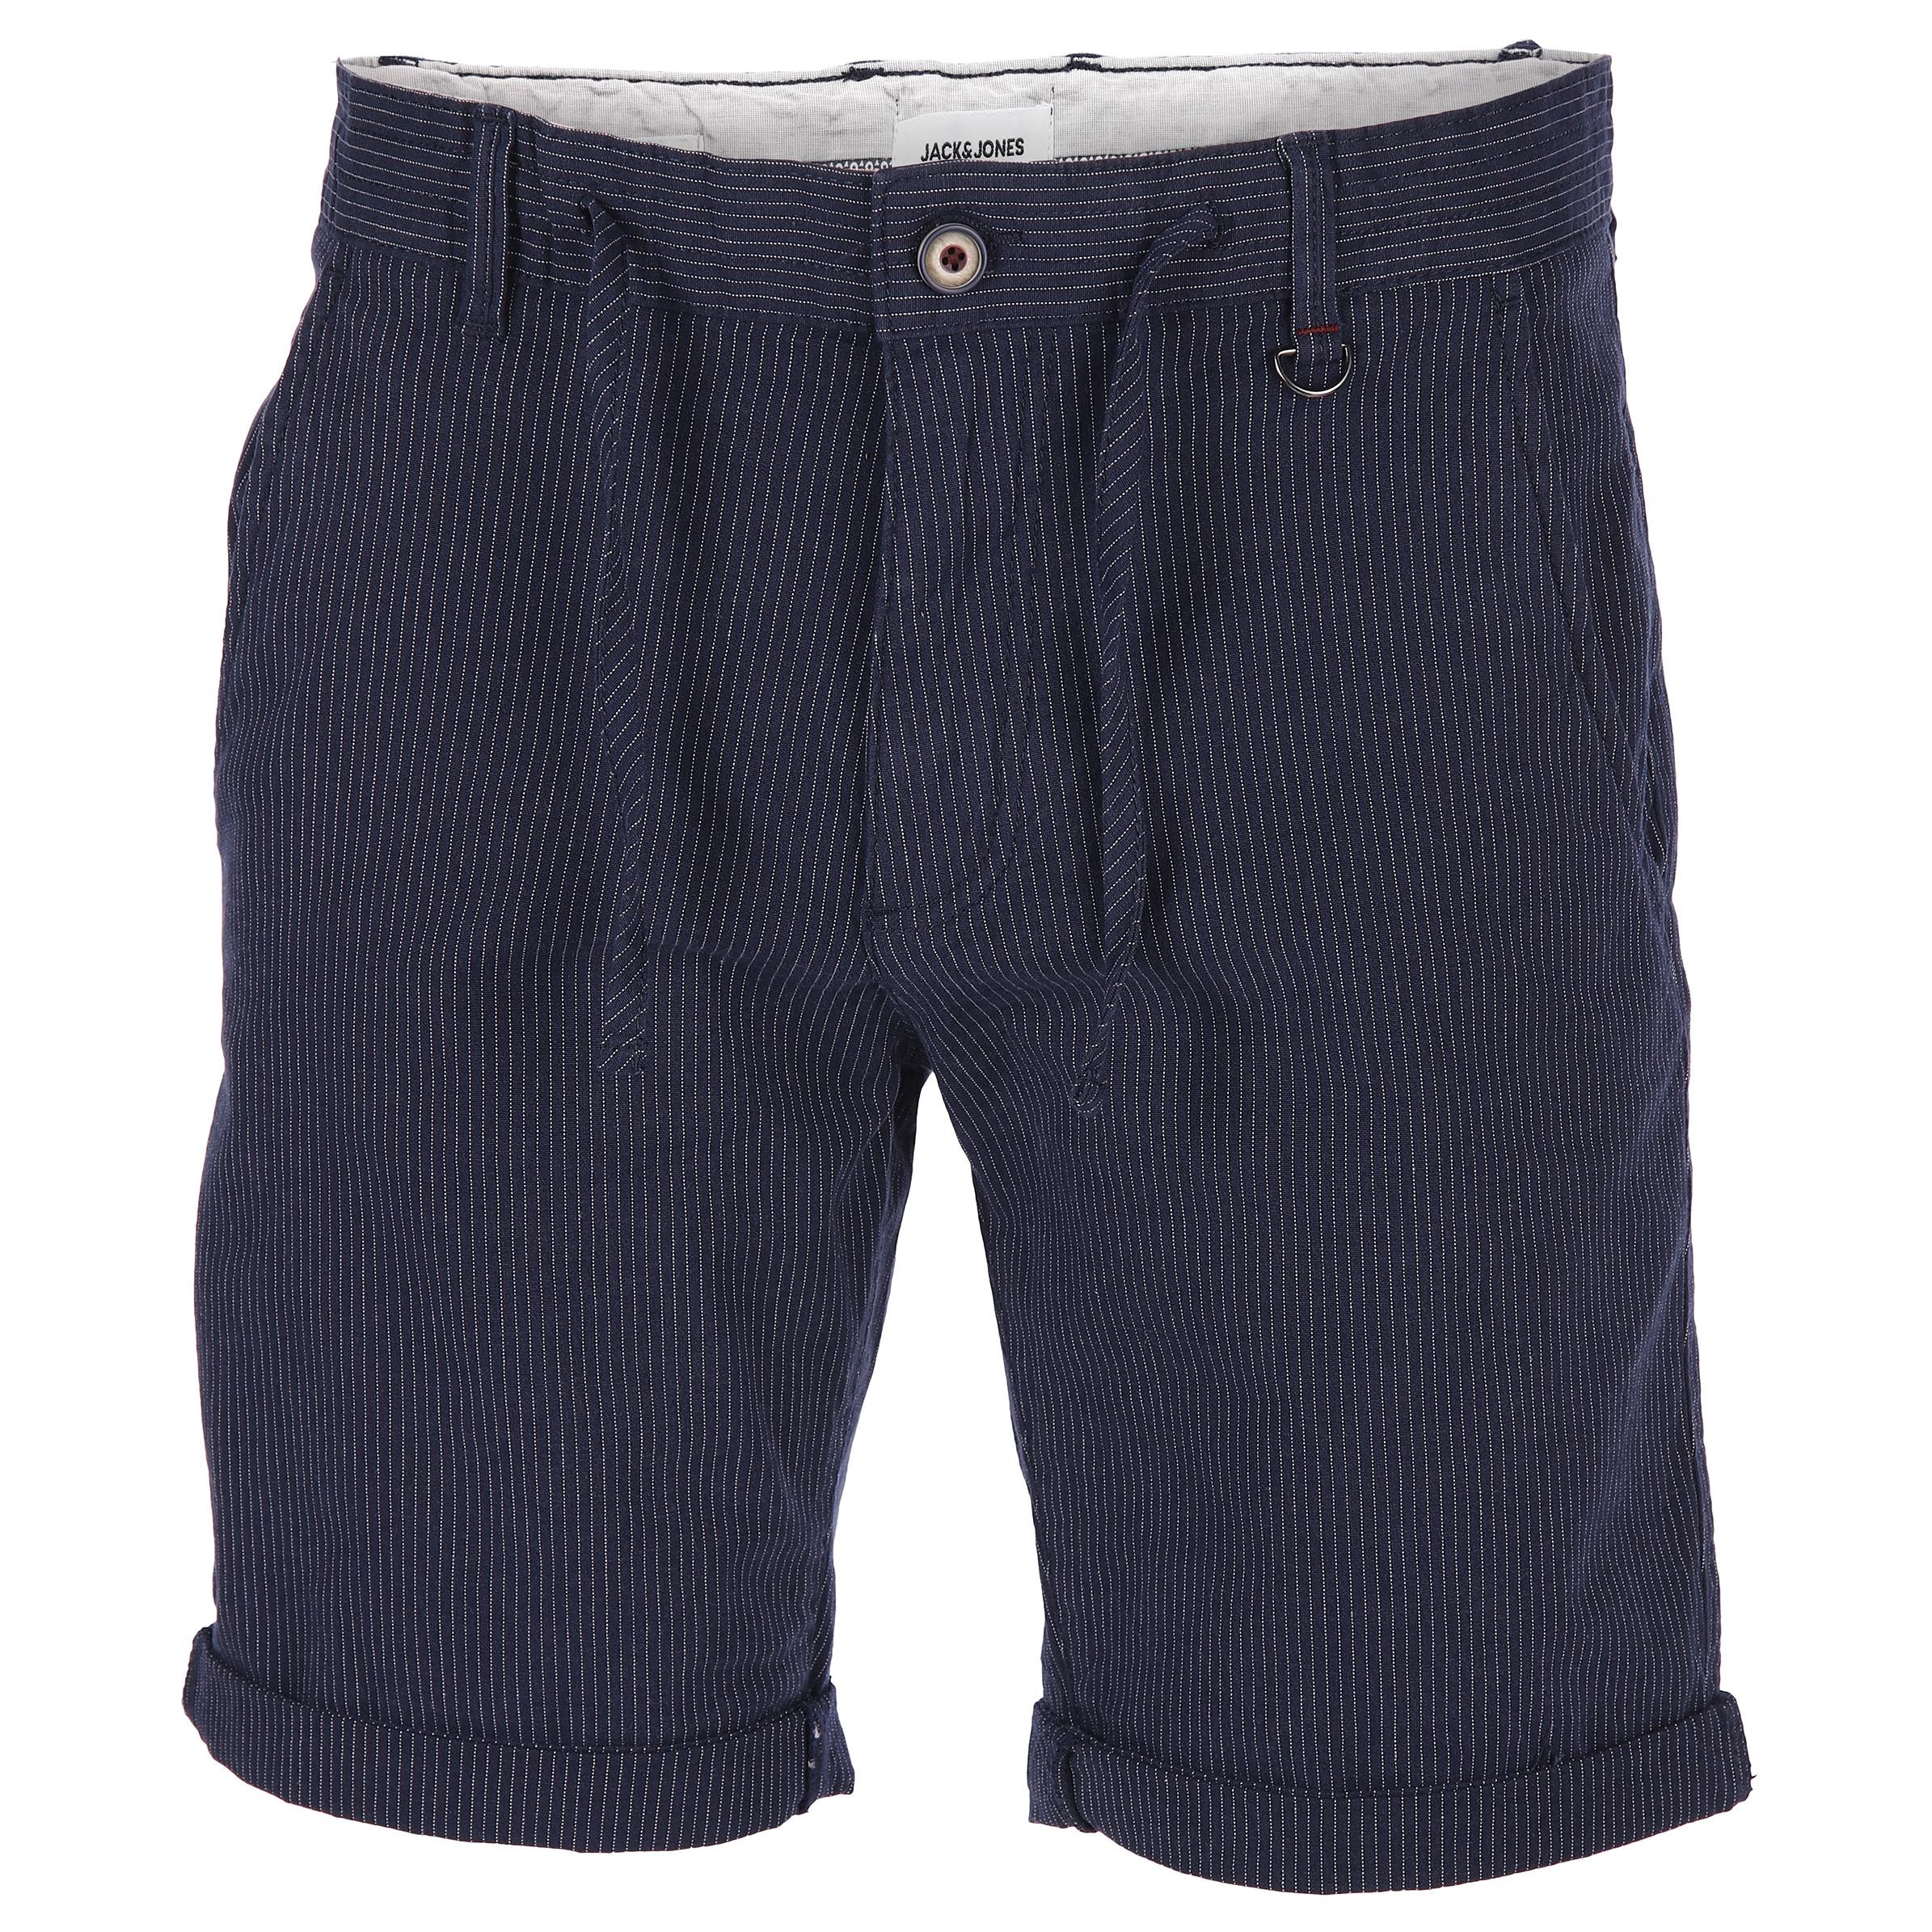 a114cbd2e8a576 Damenmode Shorts & Bermudas Roadsign Damen Shorts mit Gürtel Sommerhose kurze  Hose Chino